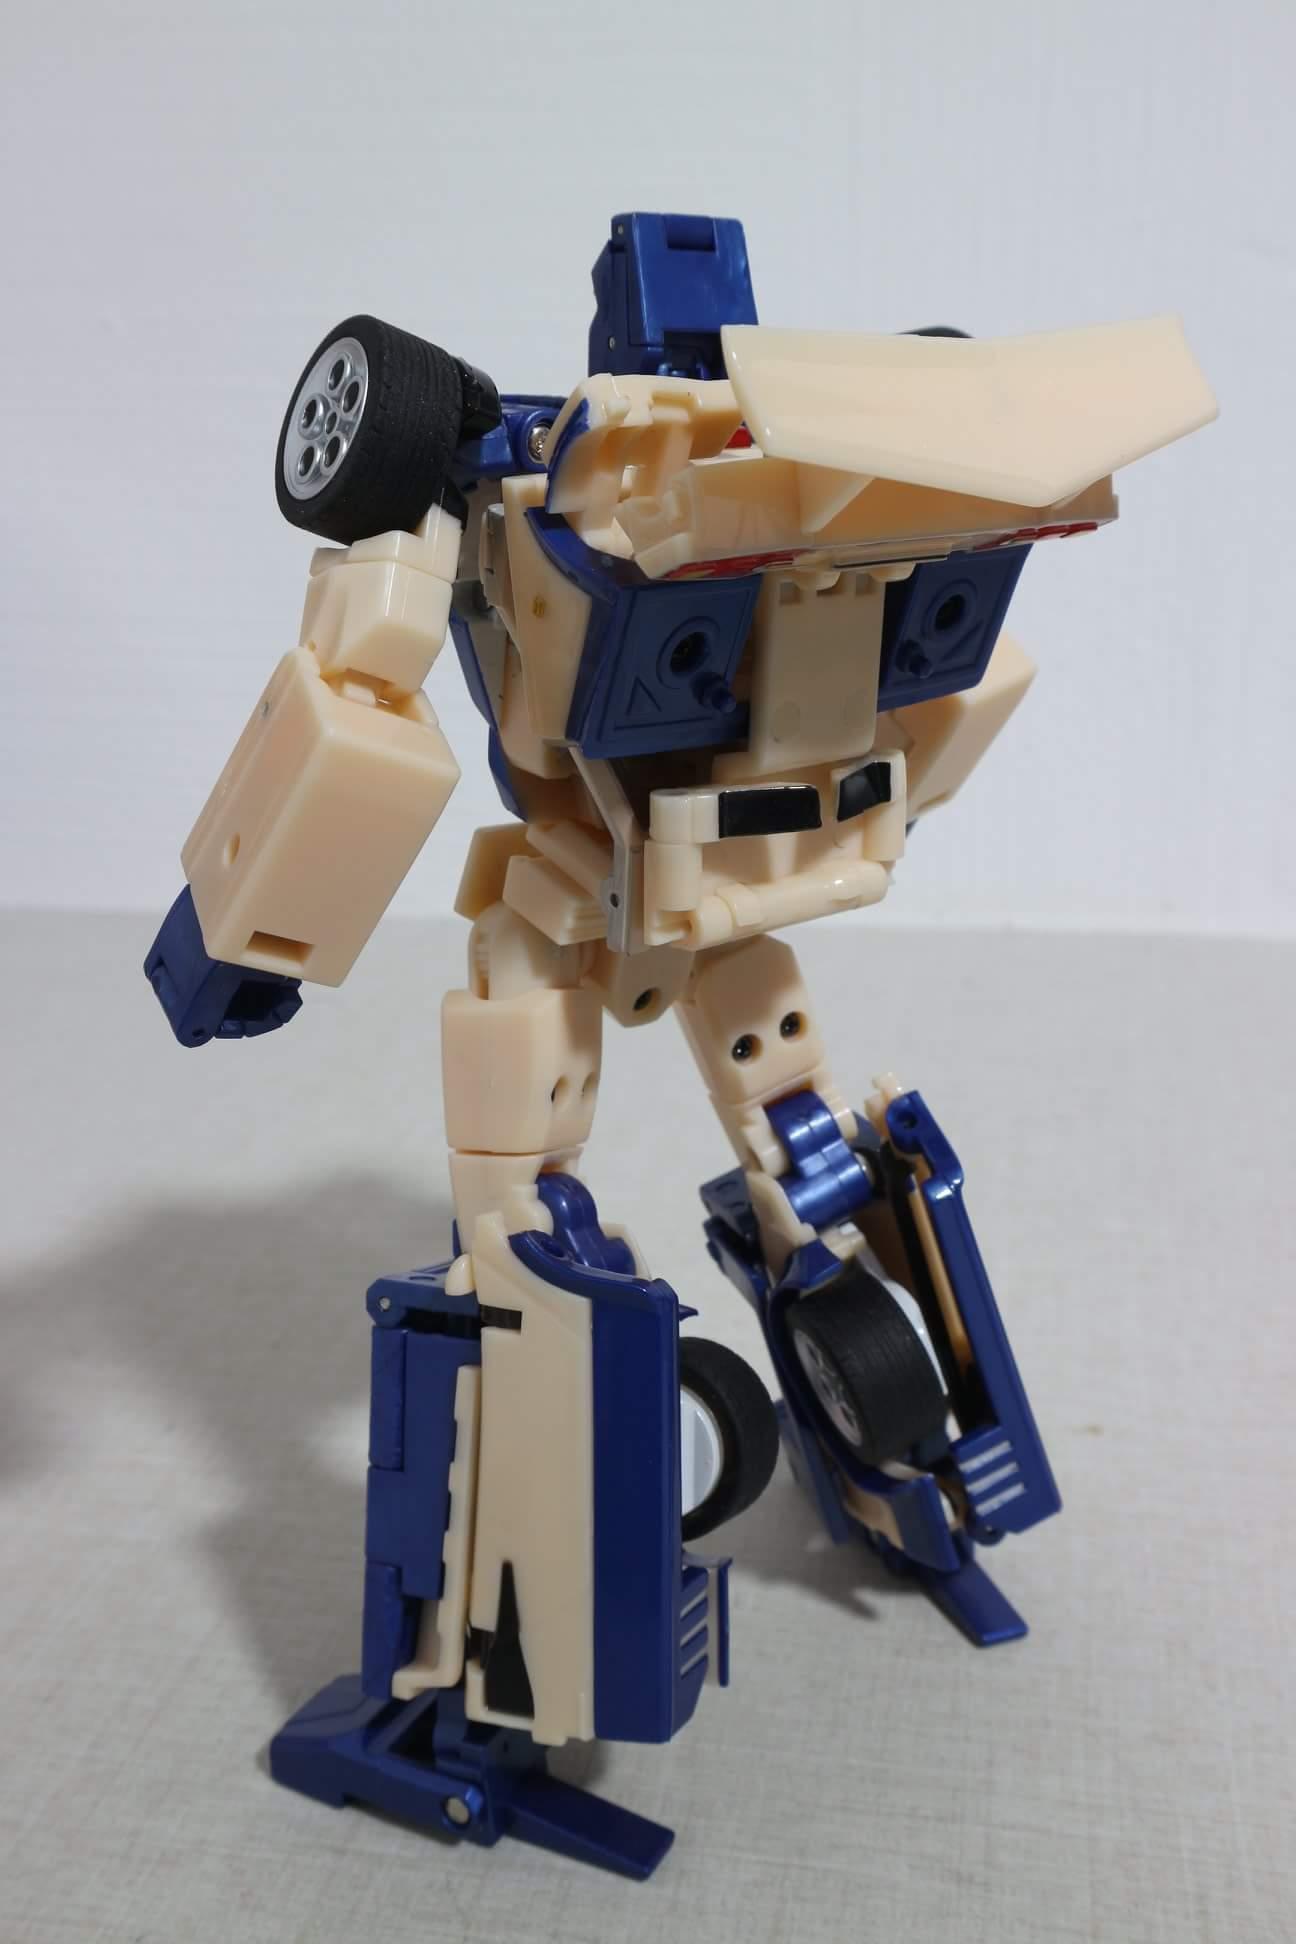 [X-Transbots] Produit Tiers - Jouets Berserkars forme Monolith (MX-XIII à MX-VII) - aka Stunticons forme Menasor/Menaseur - Page 2 IcDKGIoA_o